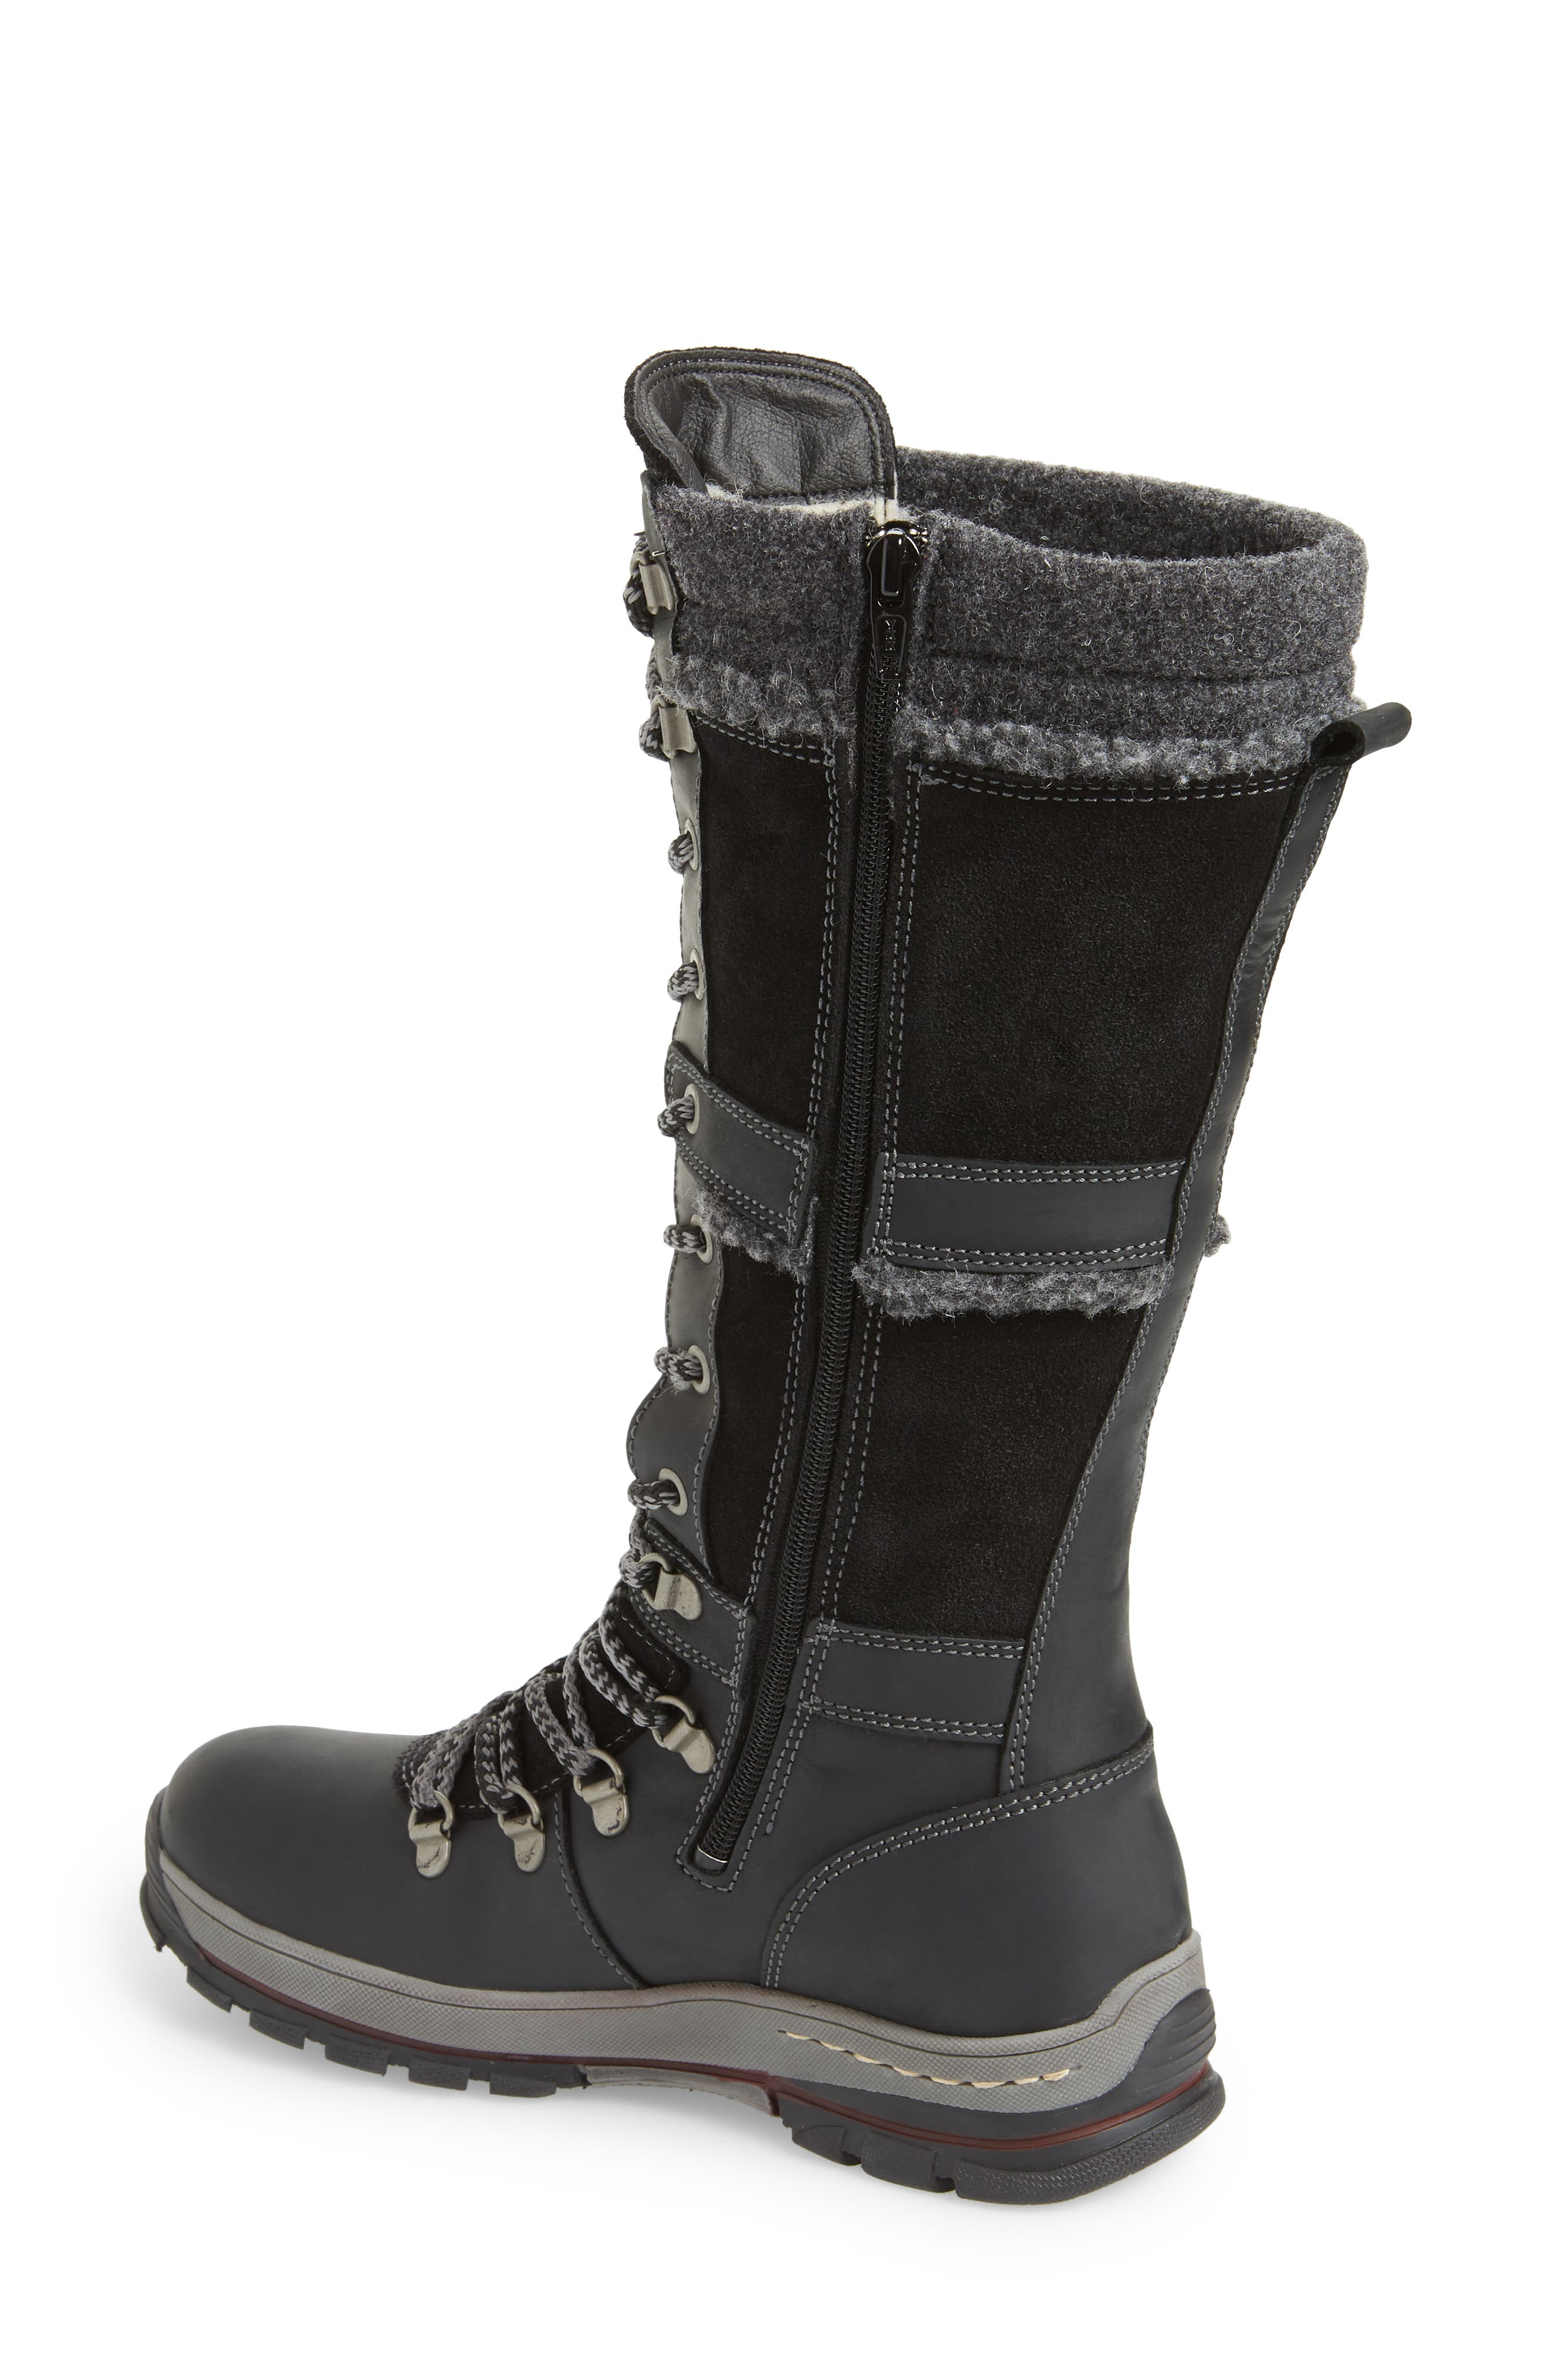 BOS. & CO., Gabriella Waterproof Boot, Alternate thumbnail 2, color, BLACK/ DARK GREY CROMAGNON